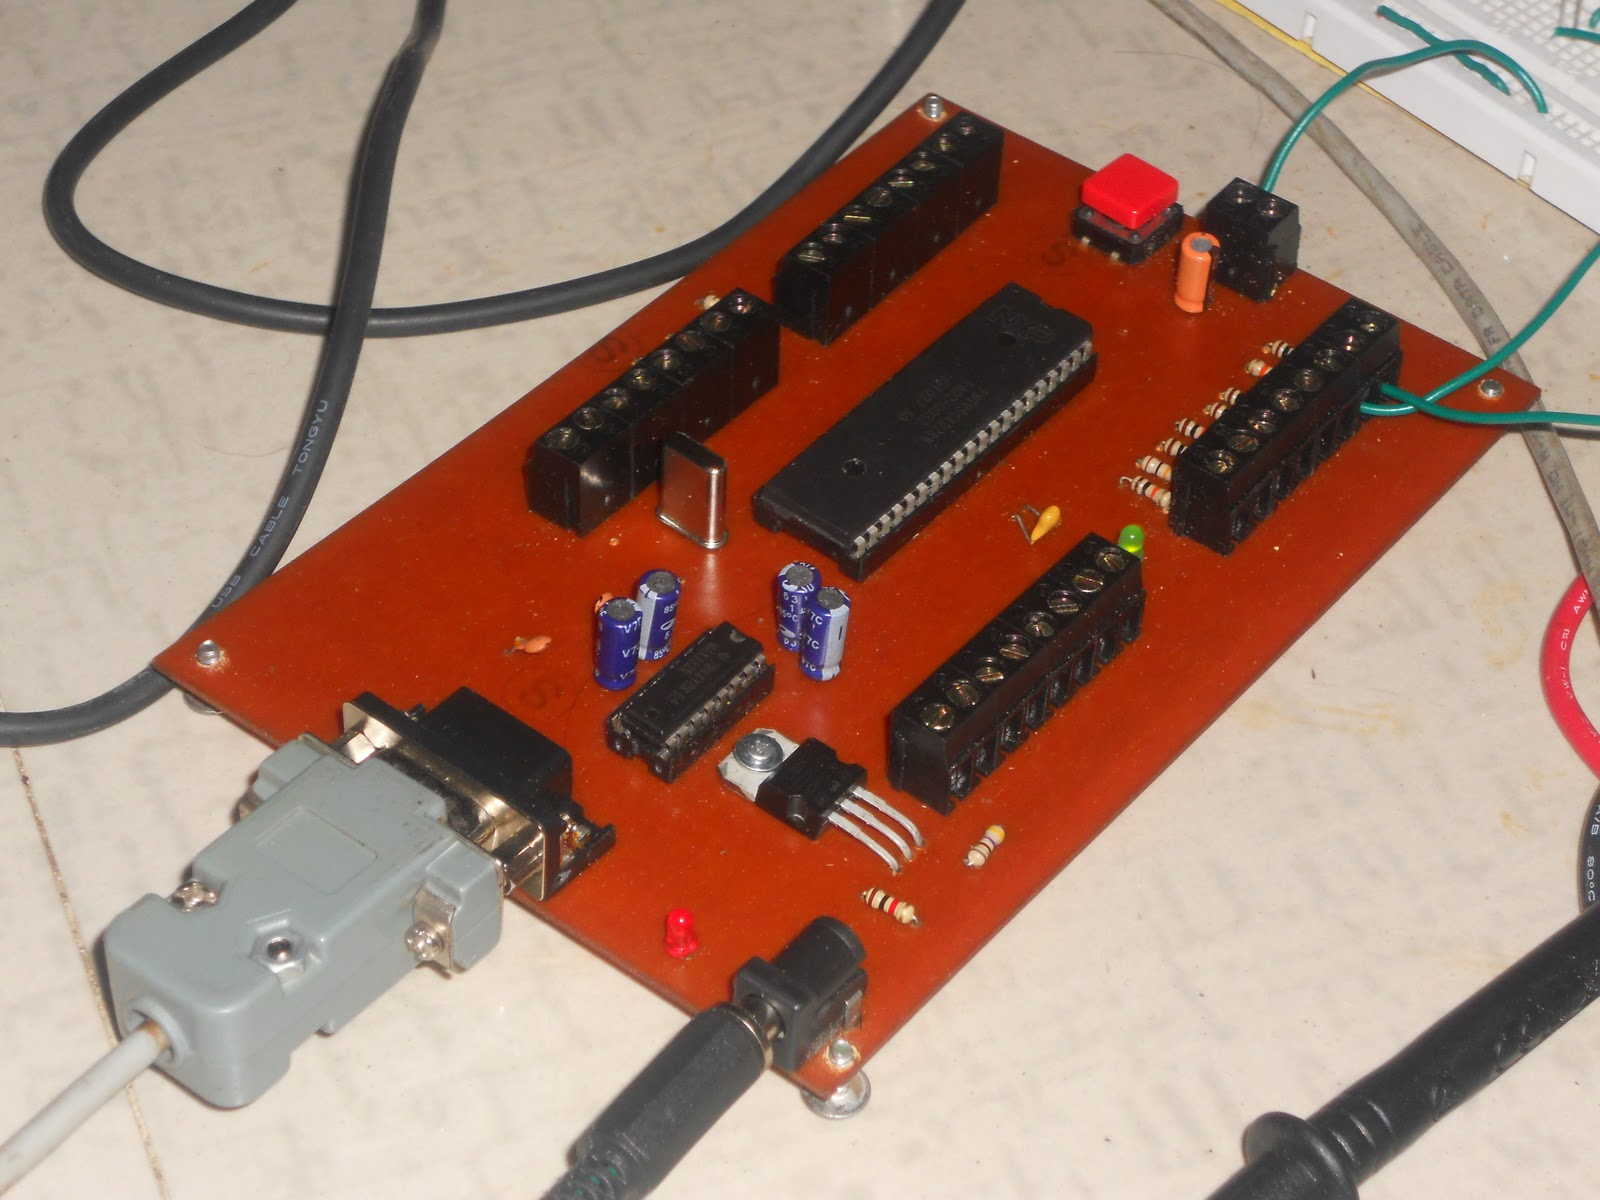 small resolution of tecfornewbie 8051 isp programmer for nxp design tuturial 8051 programmer development board schematic pcb files 8051programmer